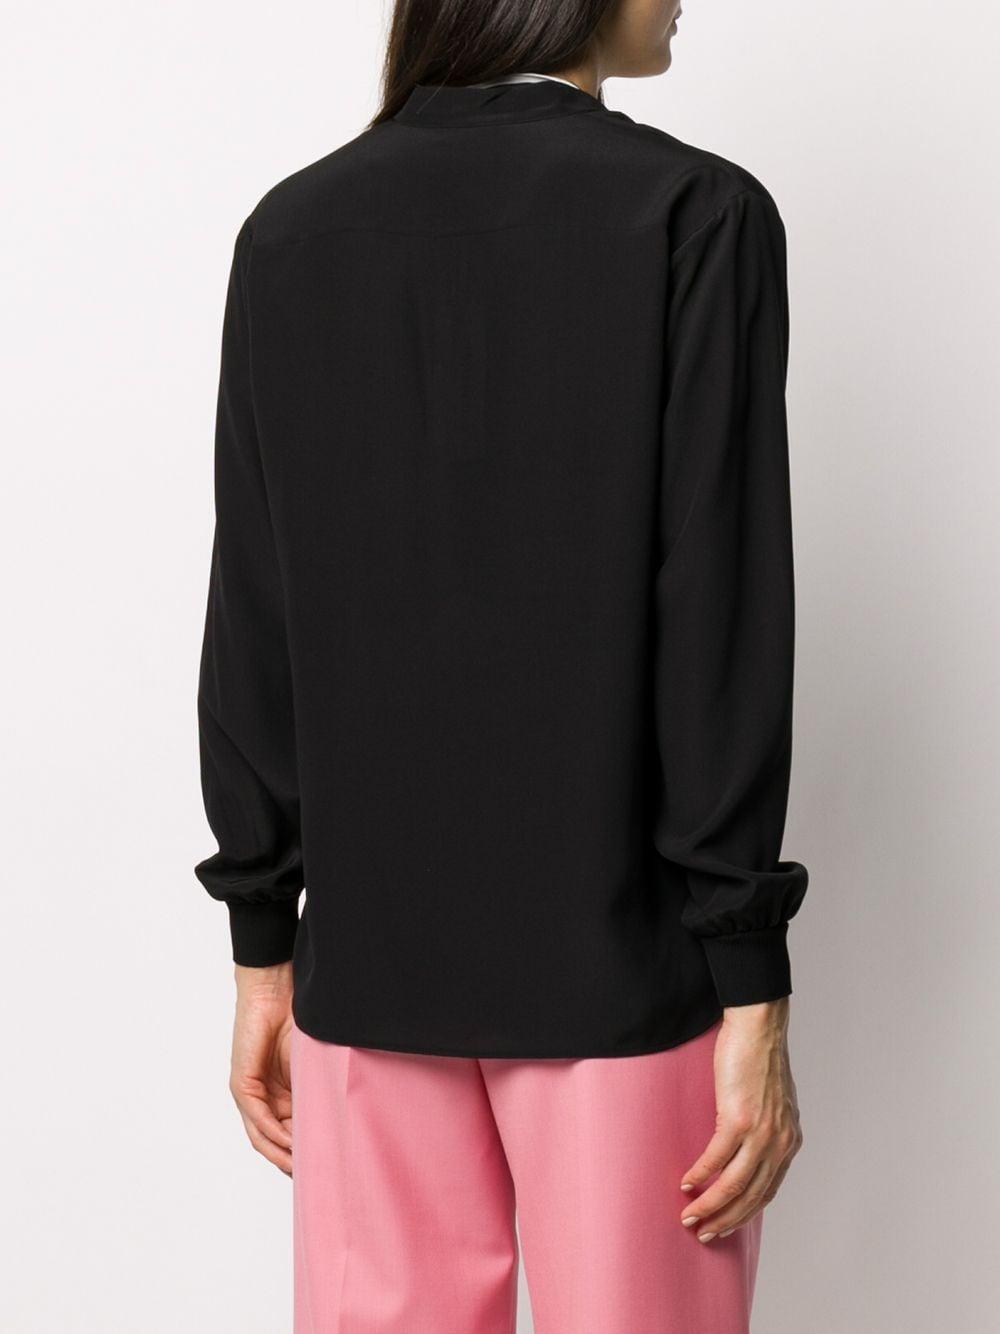 Givenchy logo print tied neck blouse